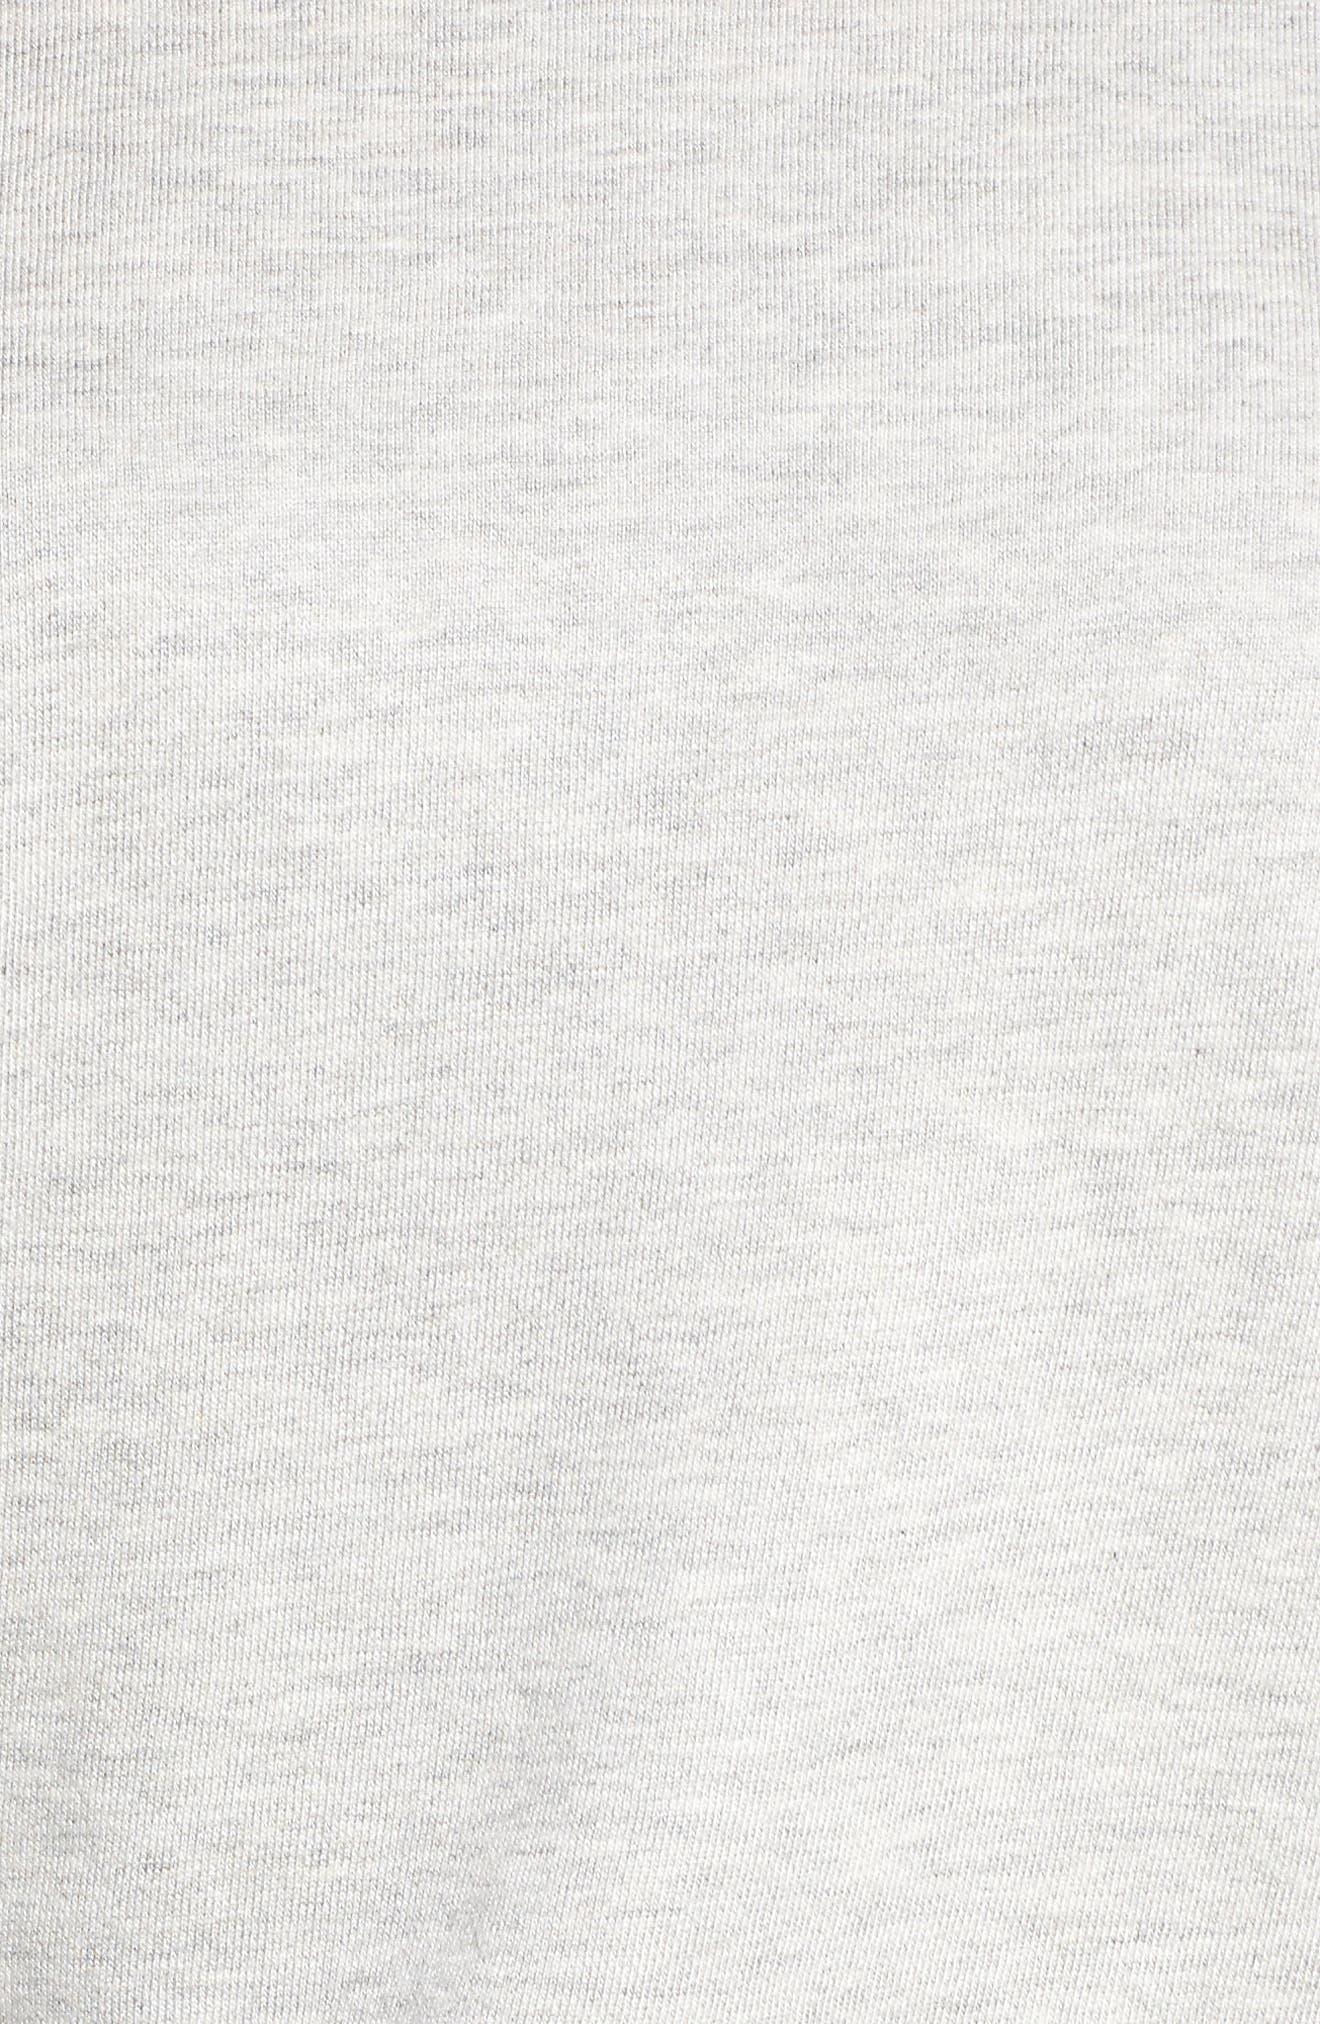 Star Raglan Pullover,                             Alternate thumbnail 6, color,                             Grey